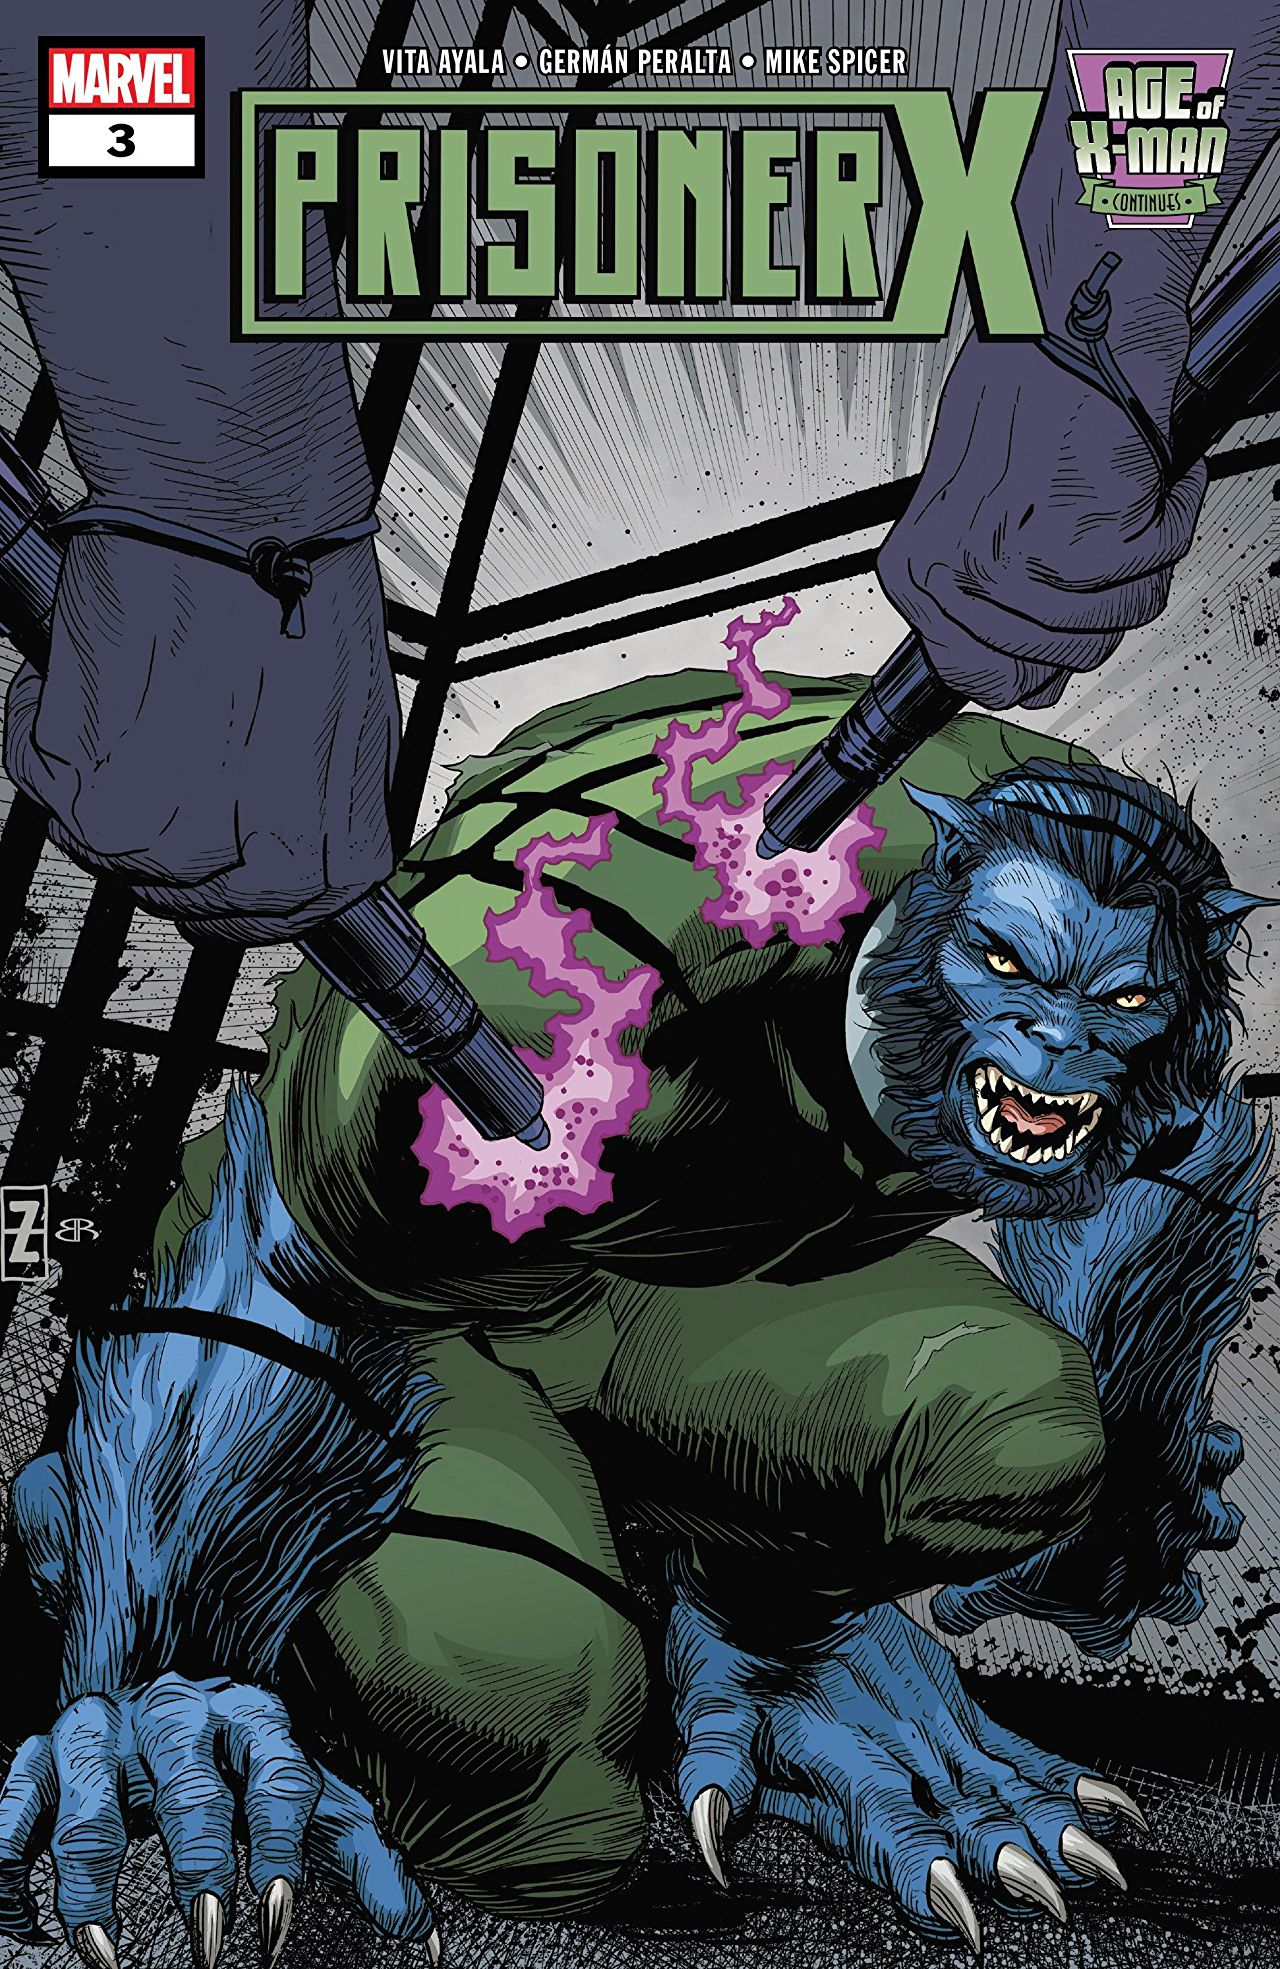 Age of X-Man: Prisoner X Vol 1 3